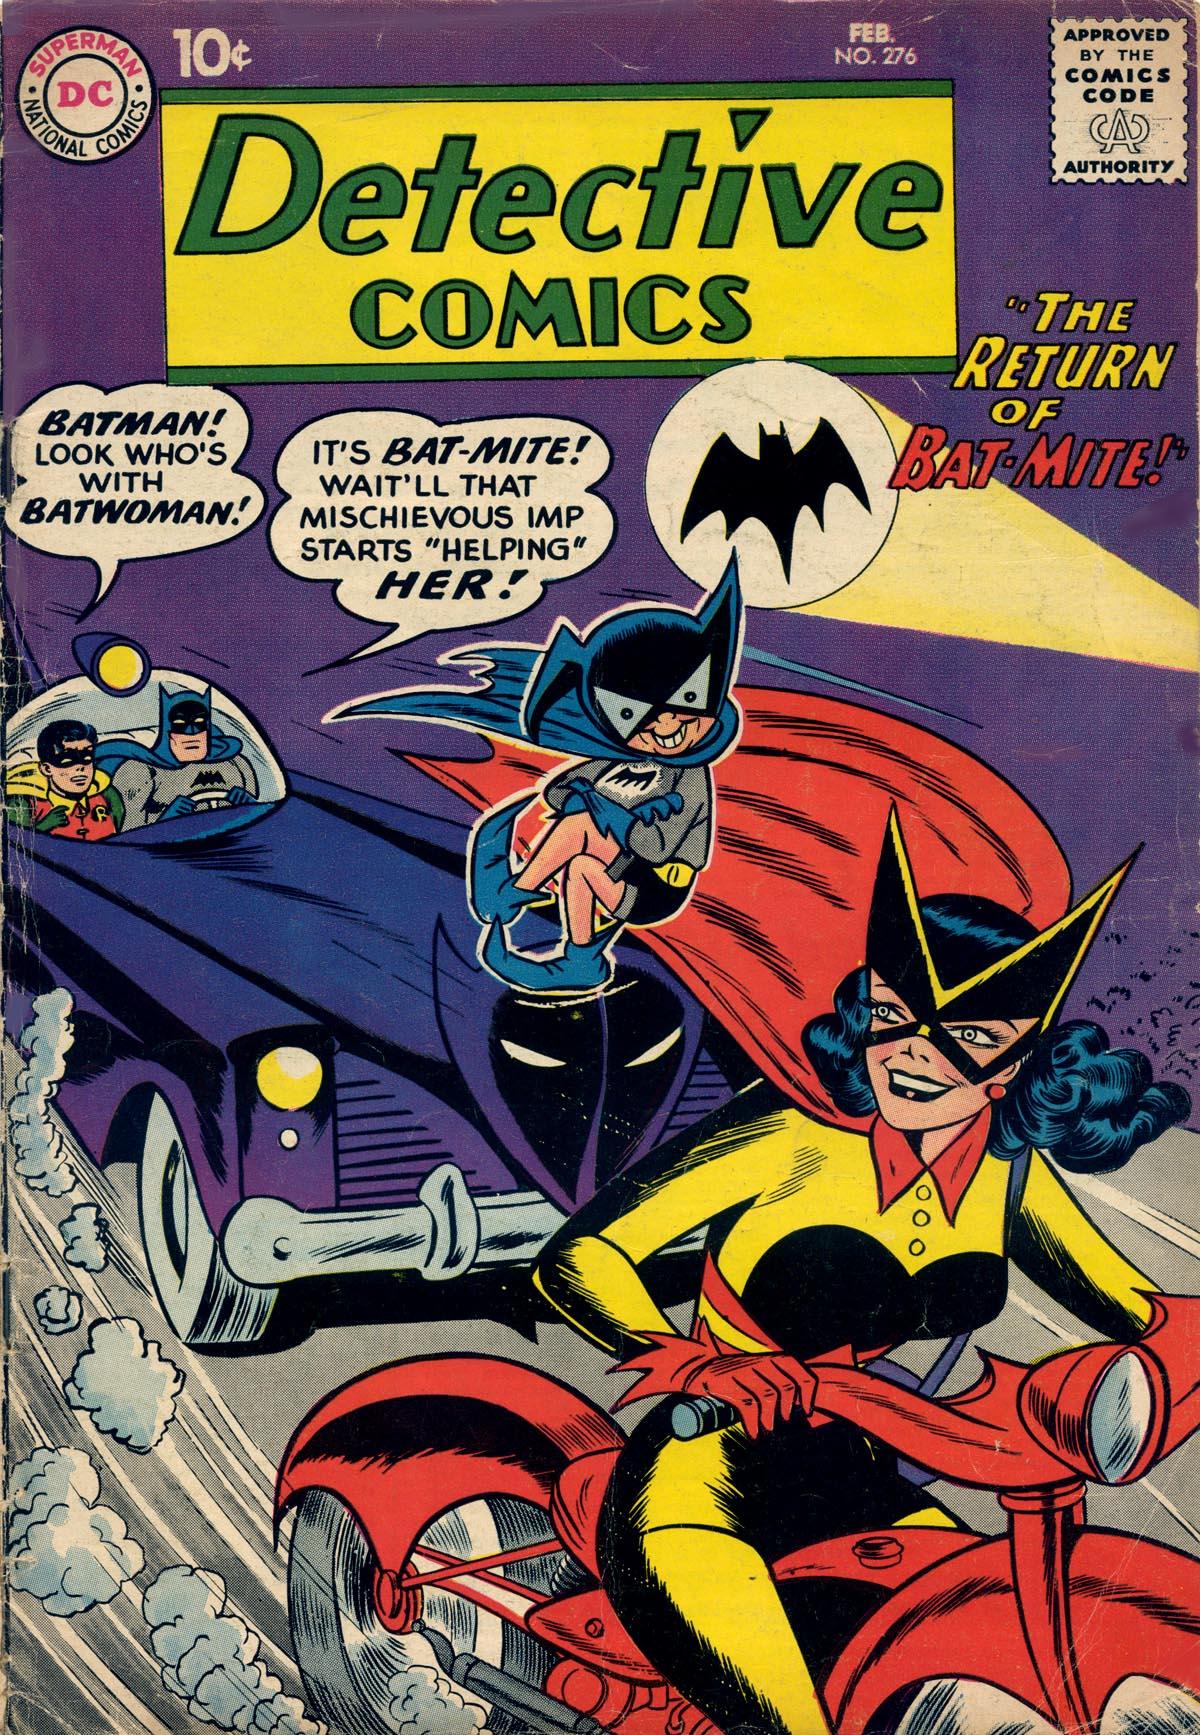 Detective Comics (1937) 276 Page 1